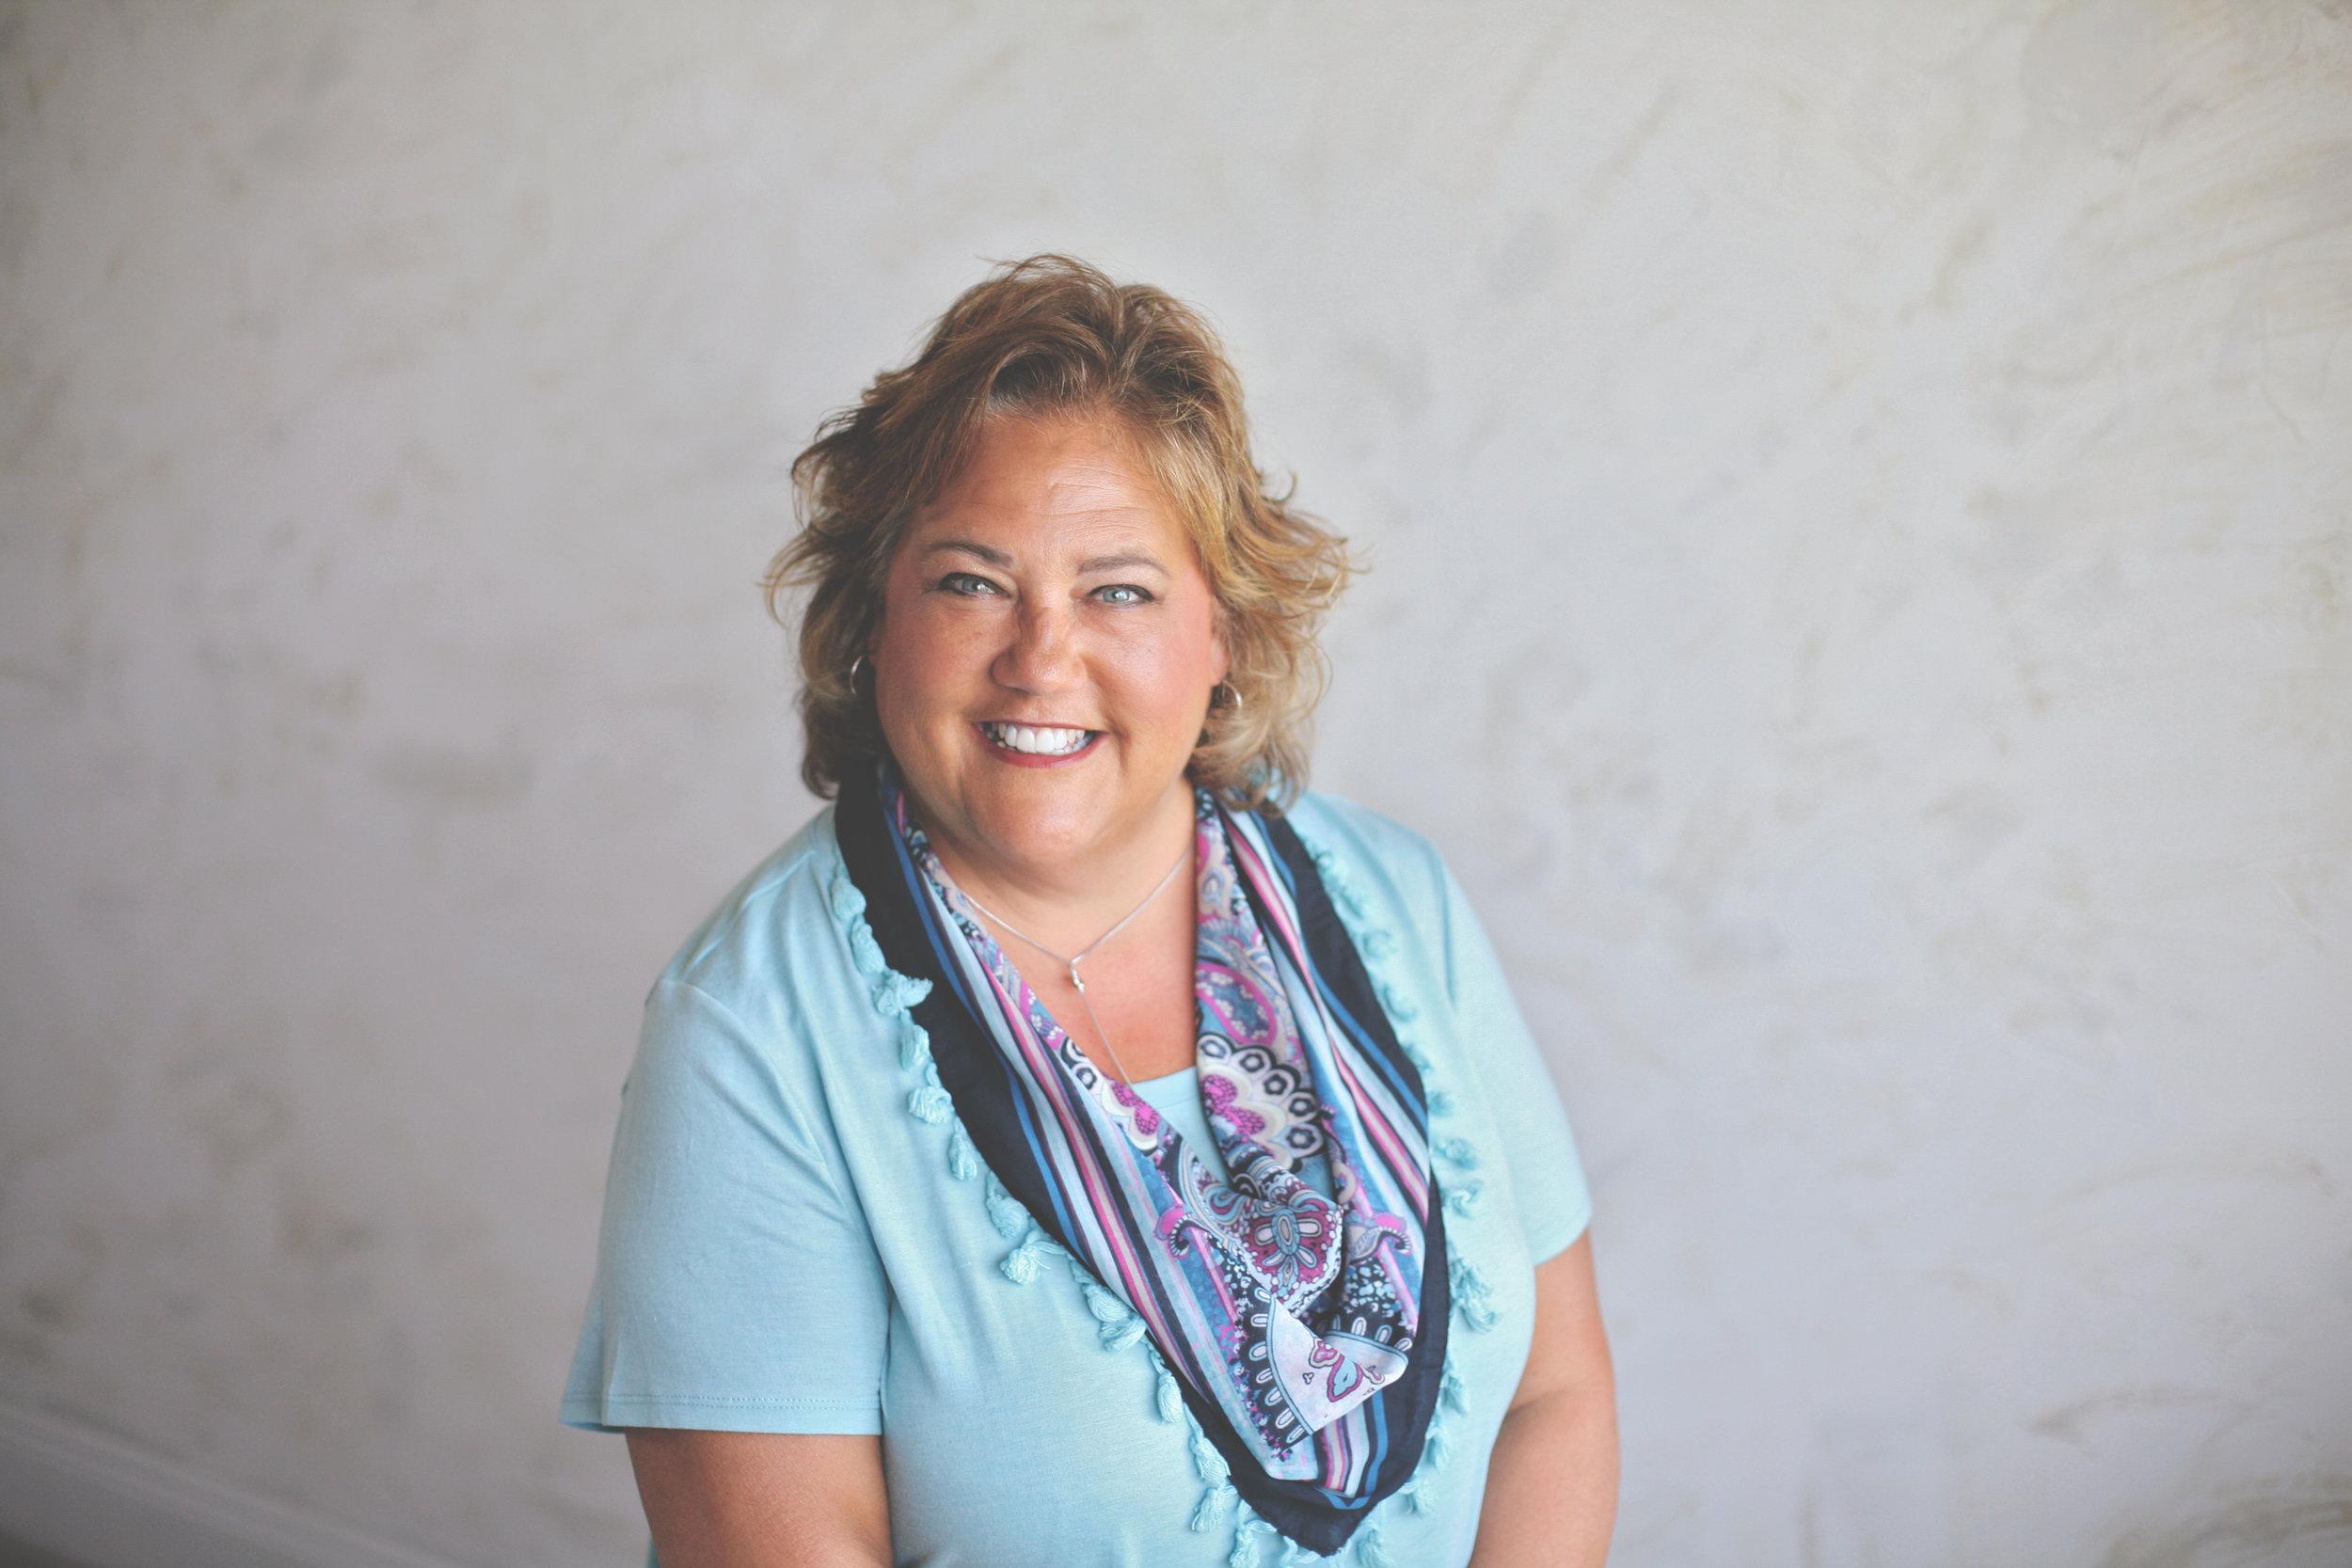 Trish Stiles, Sales Executive Trish@cateringbysuzette.com